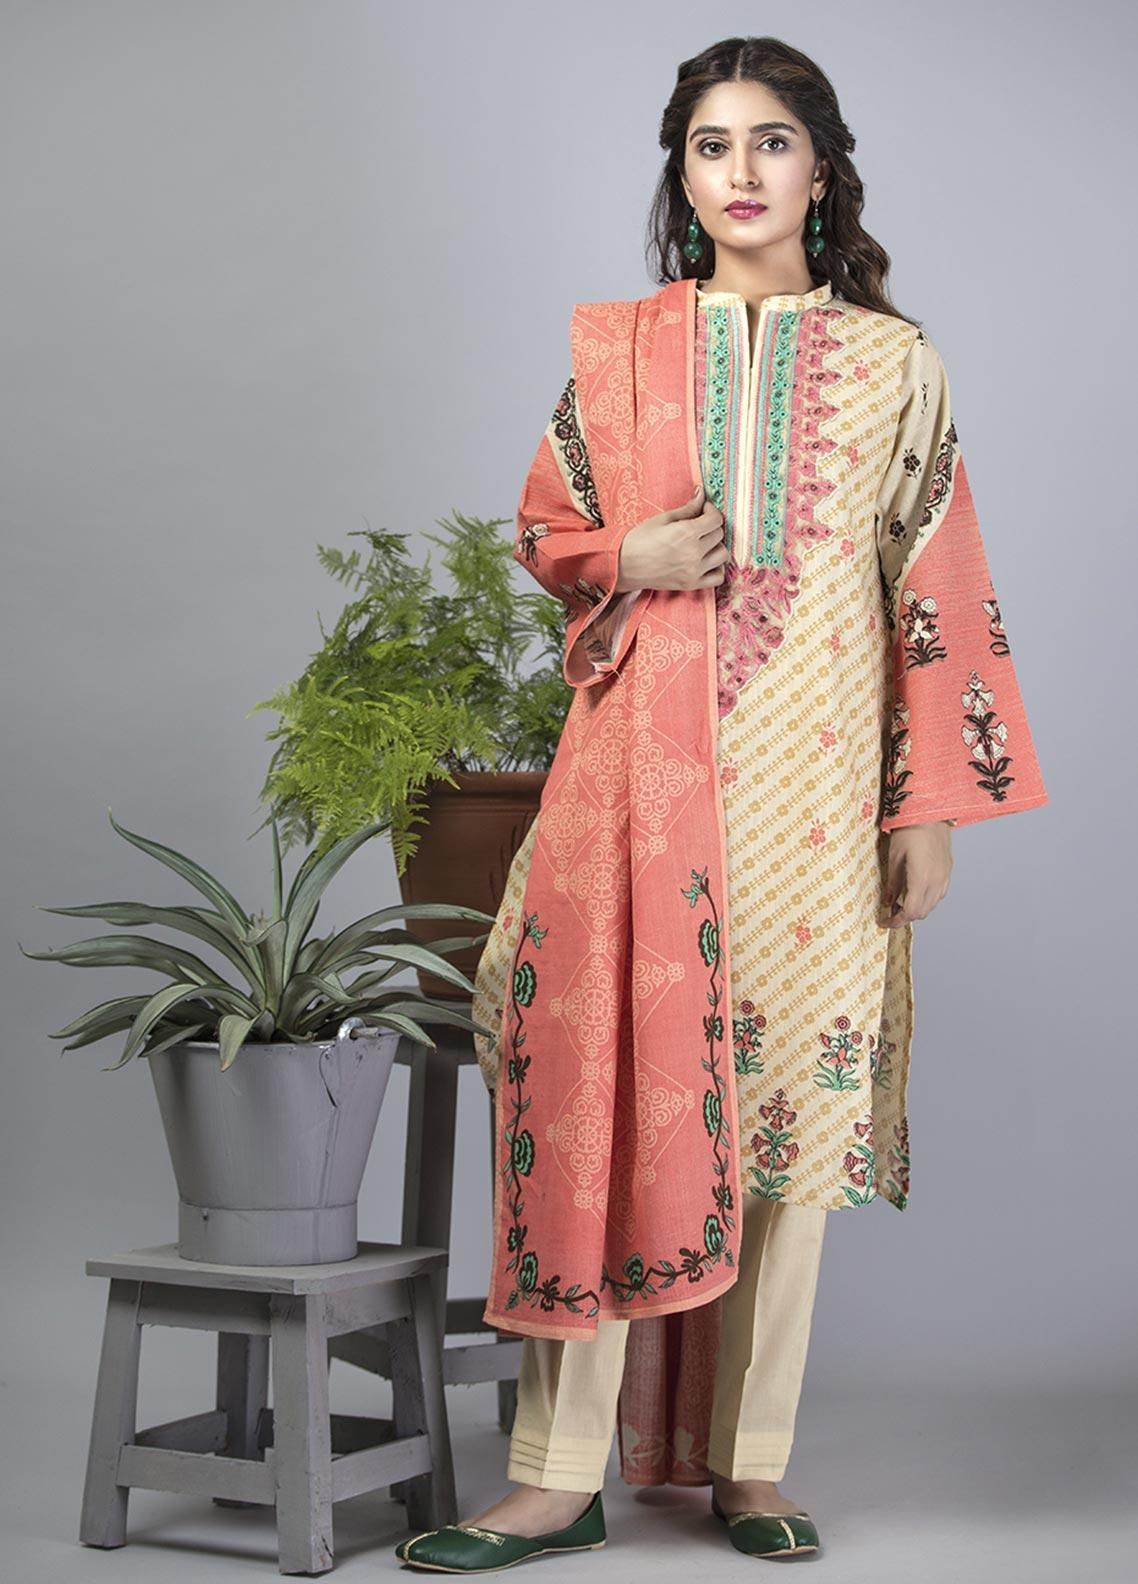 Senorita Casual Cotton Stitched 3 Piece Suit LAD-01403-FAWN - PEACH